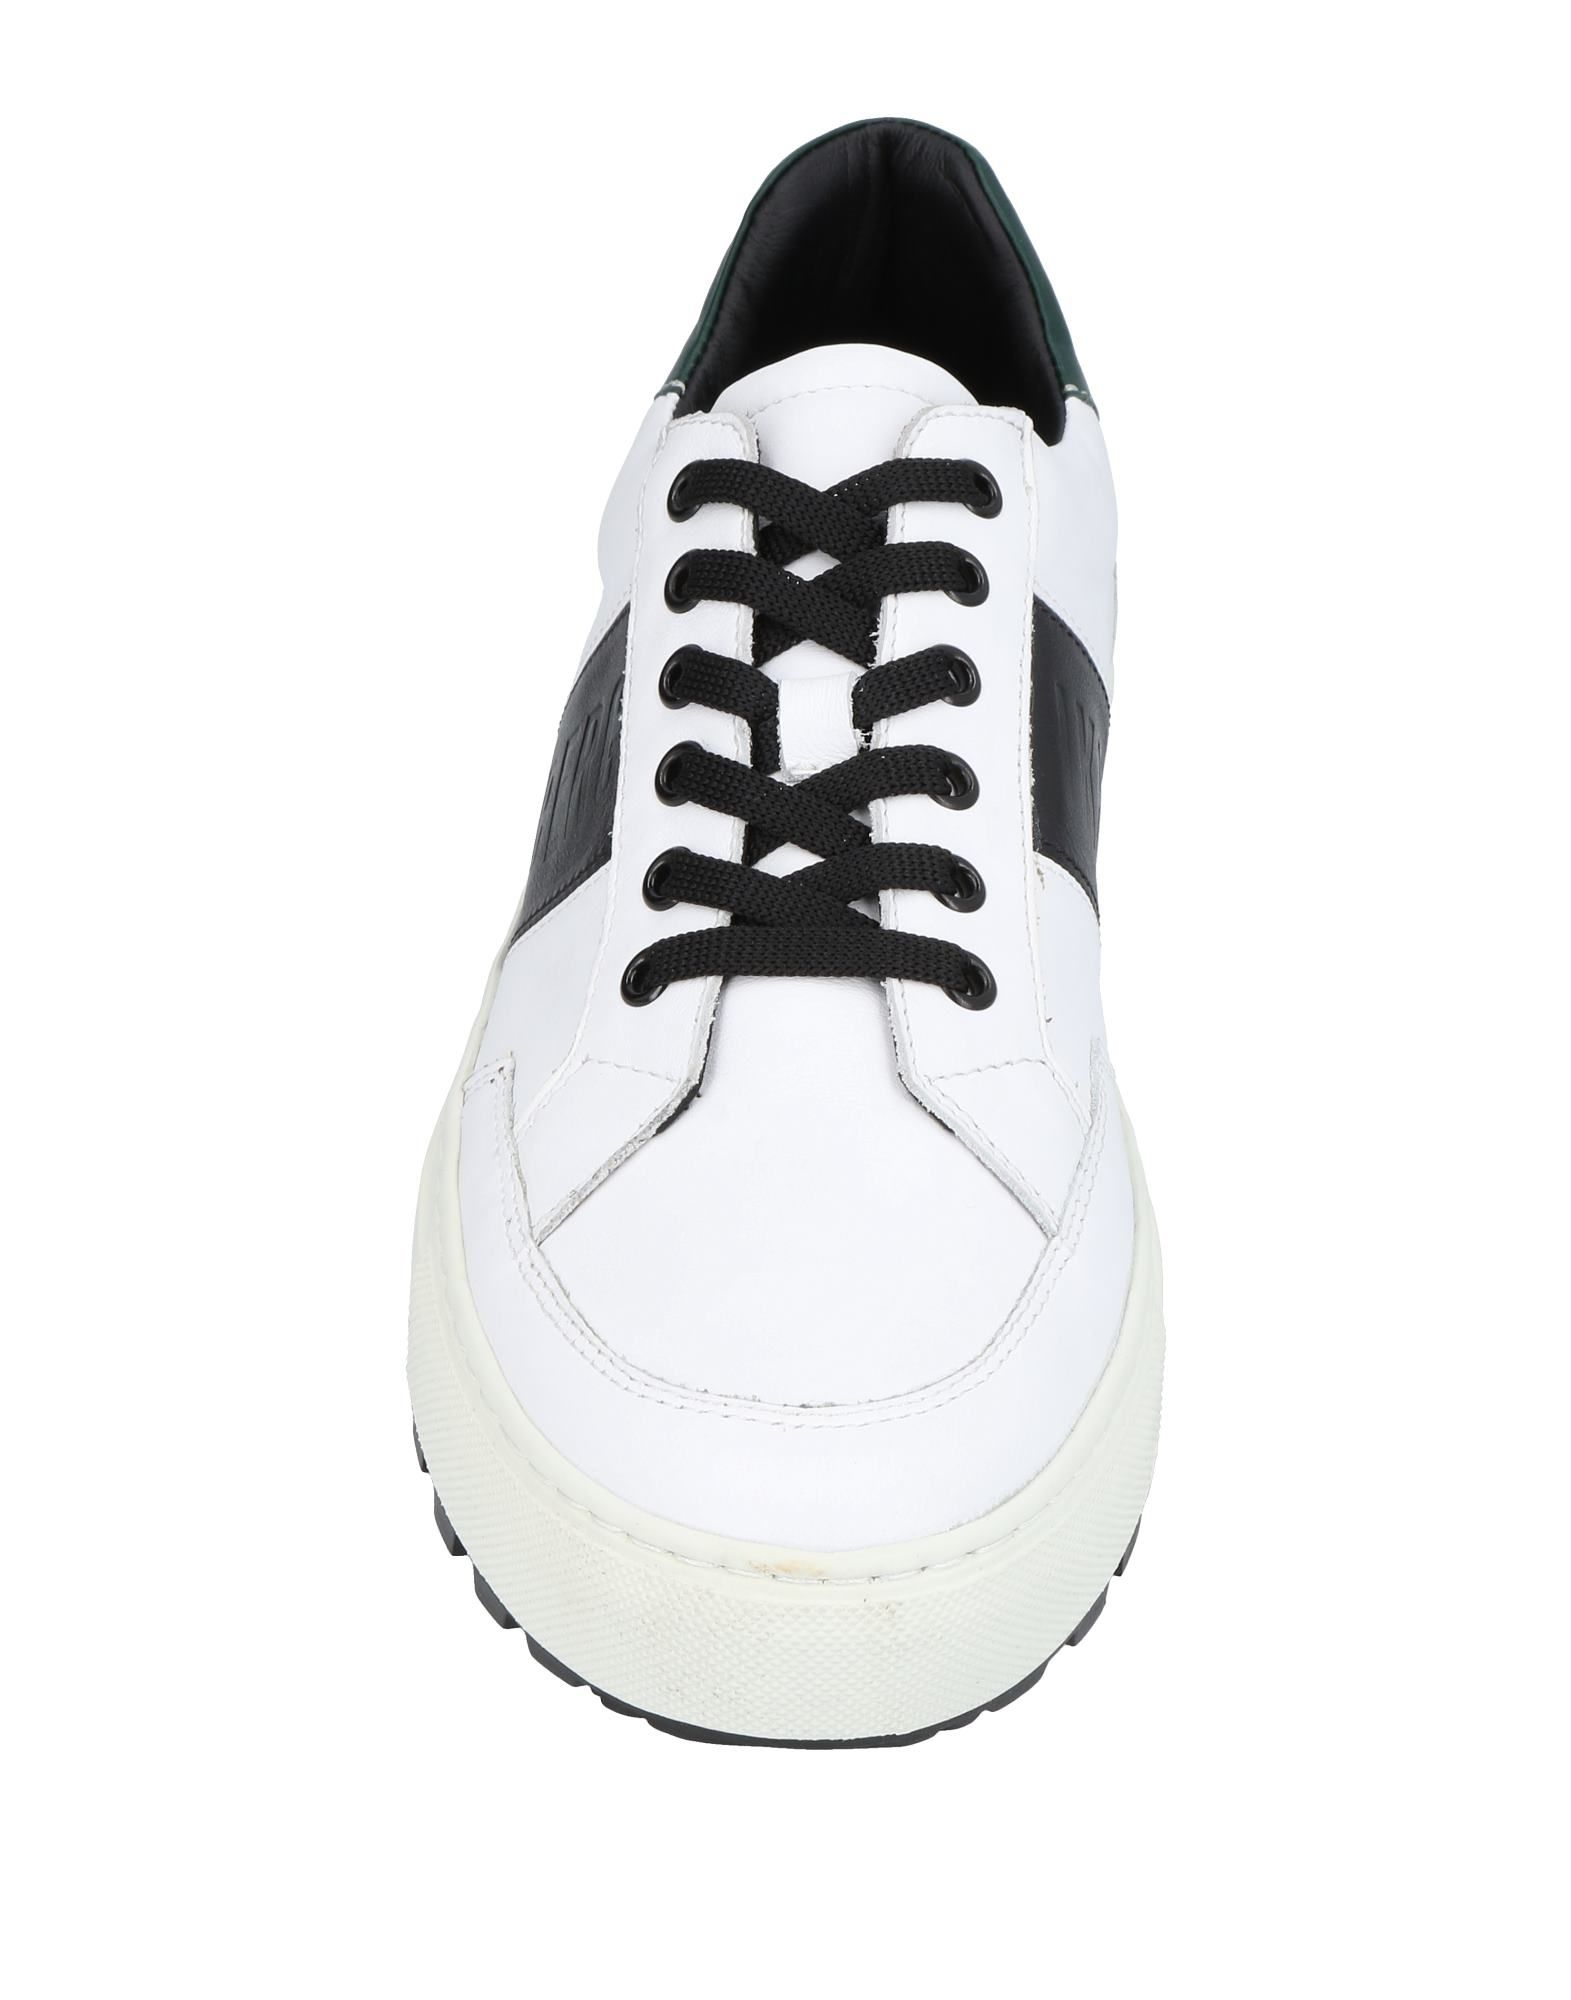 Bikkembergs Bikkembergs Bikkembergs Sneakers Herren  11451075WB Gute Qualität beliebte Schuhe 1b2707